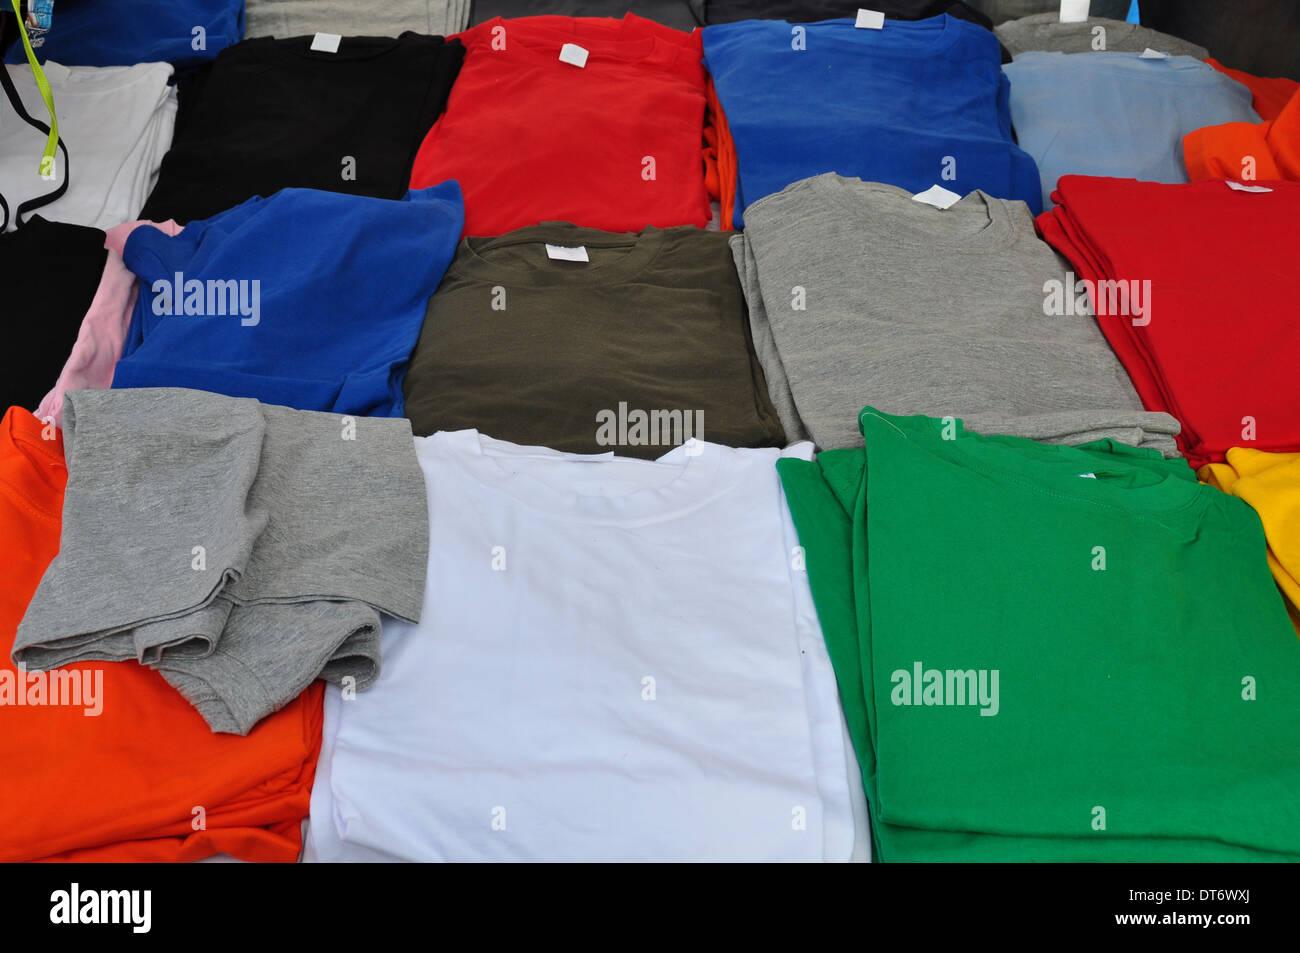 Coloridas camisetas de manga corta de fondo. Casual ropa de verano. Imagen De Stock